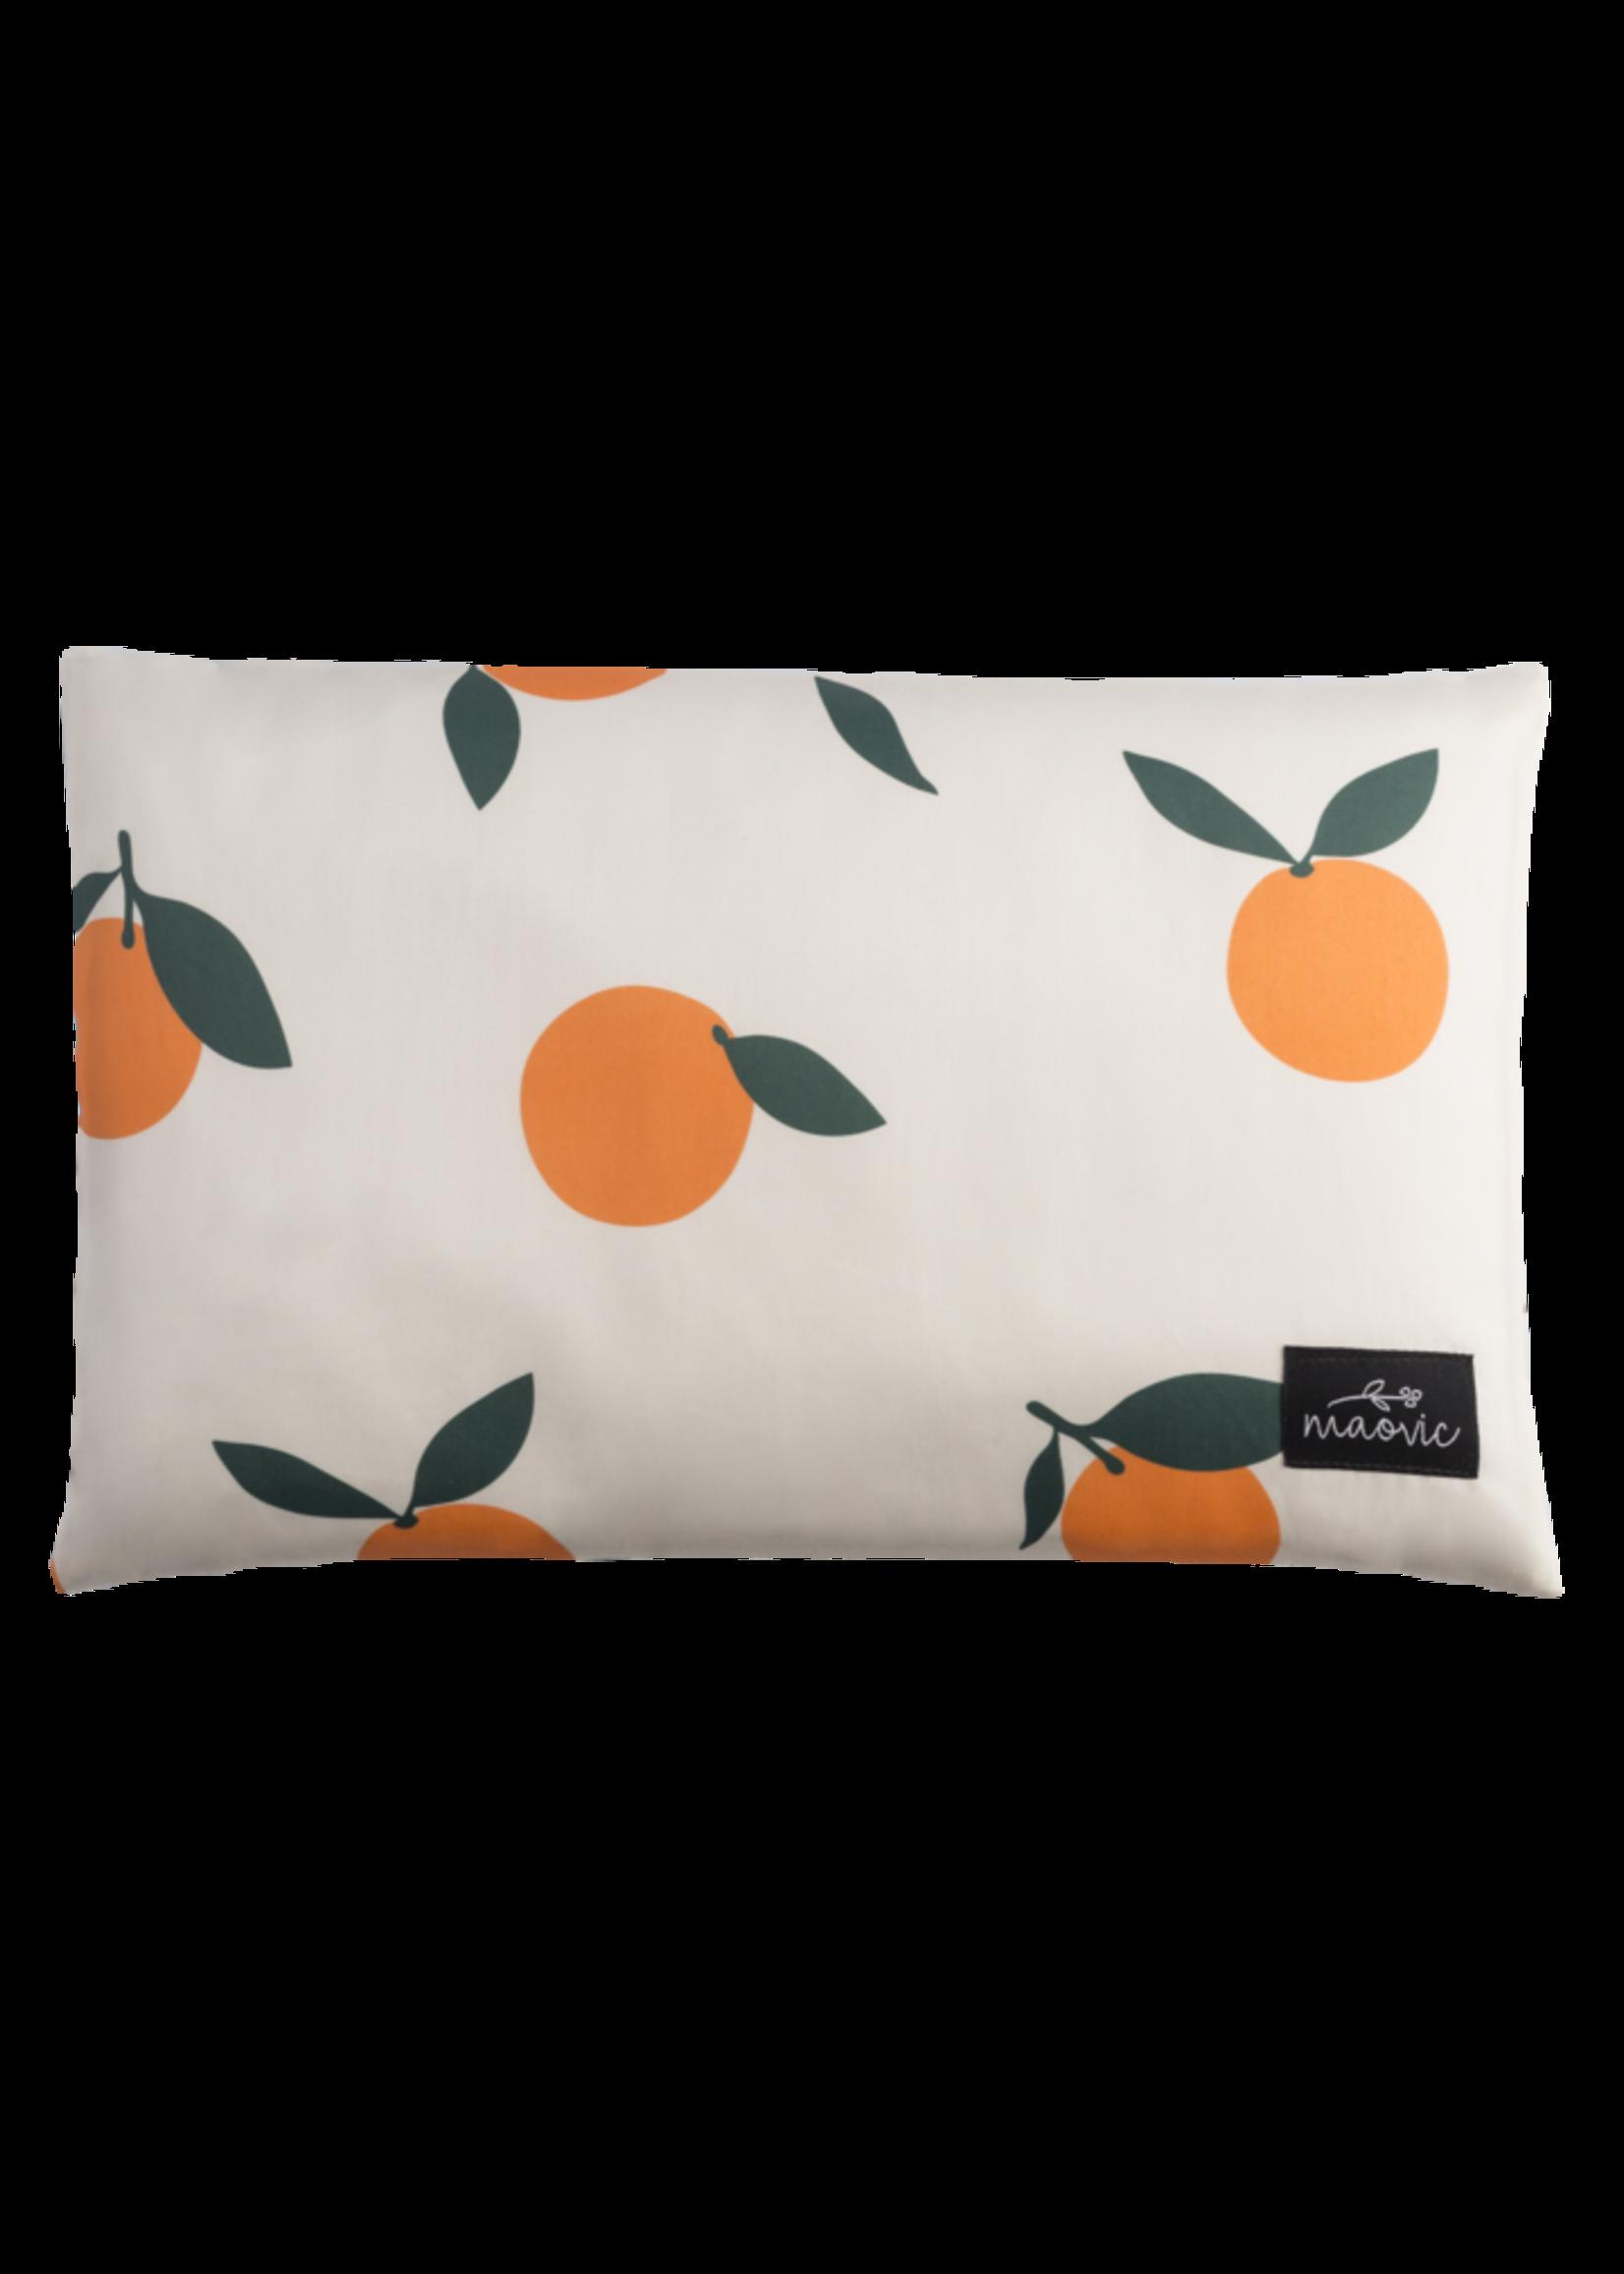 Maovic Oreiller Mandarine